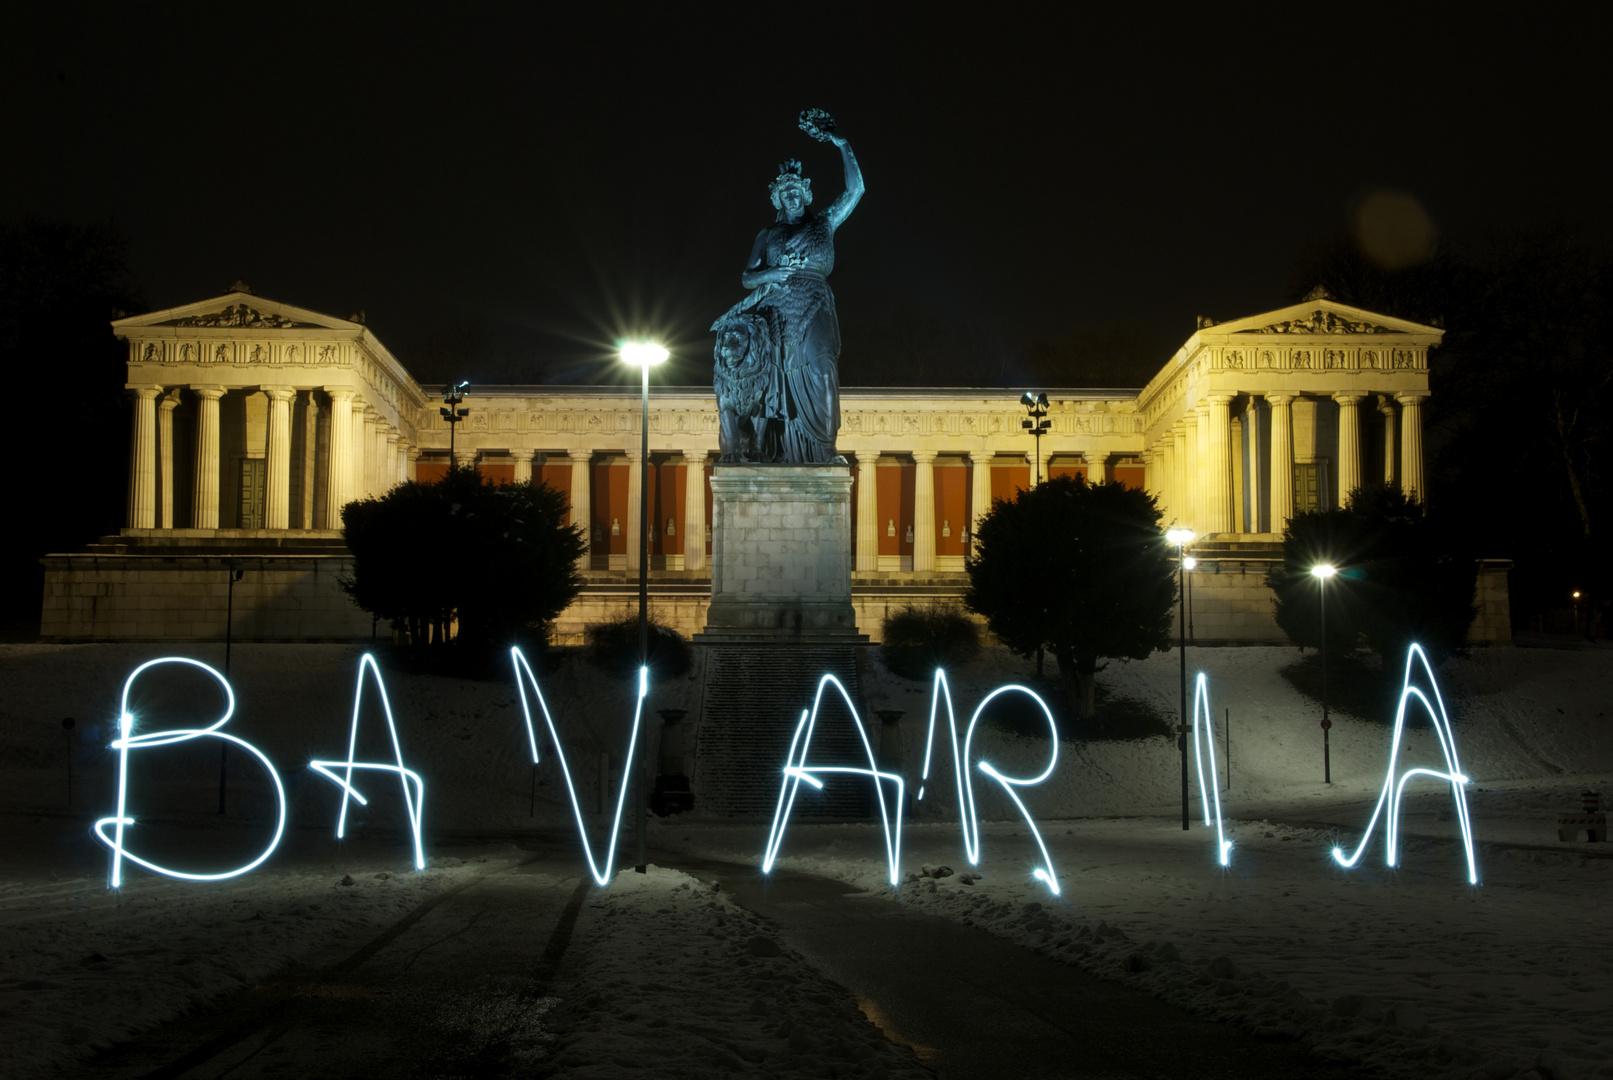 BAVARIA II